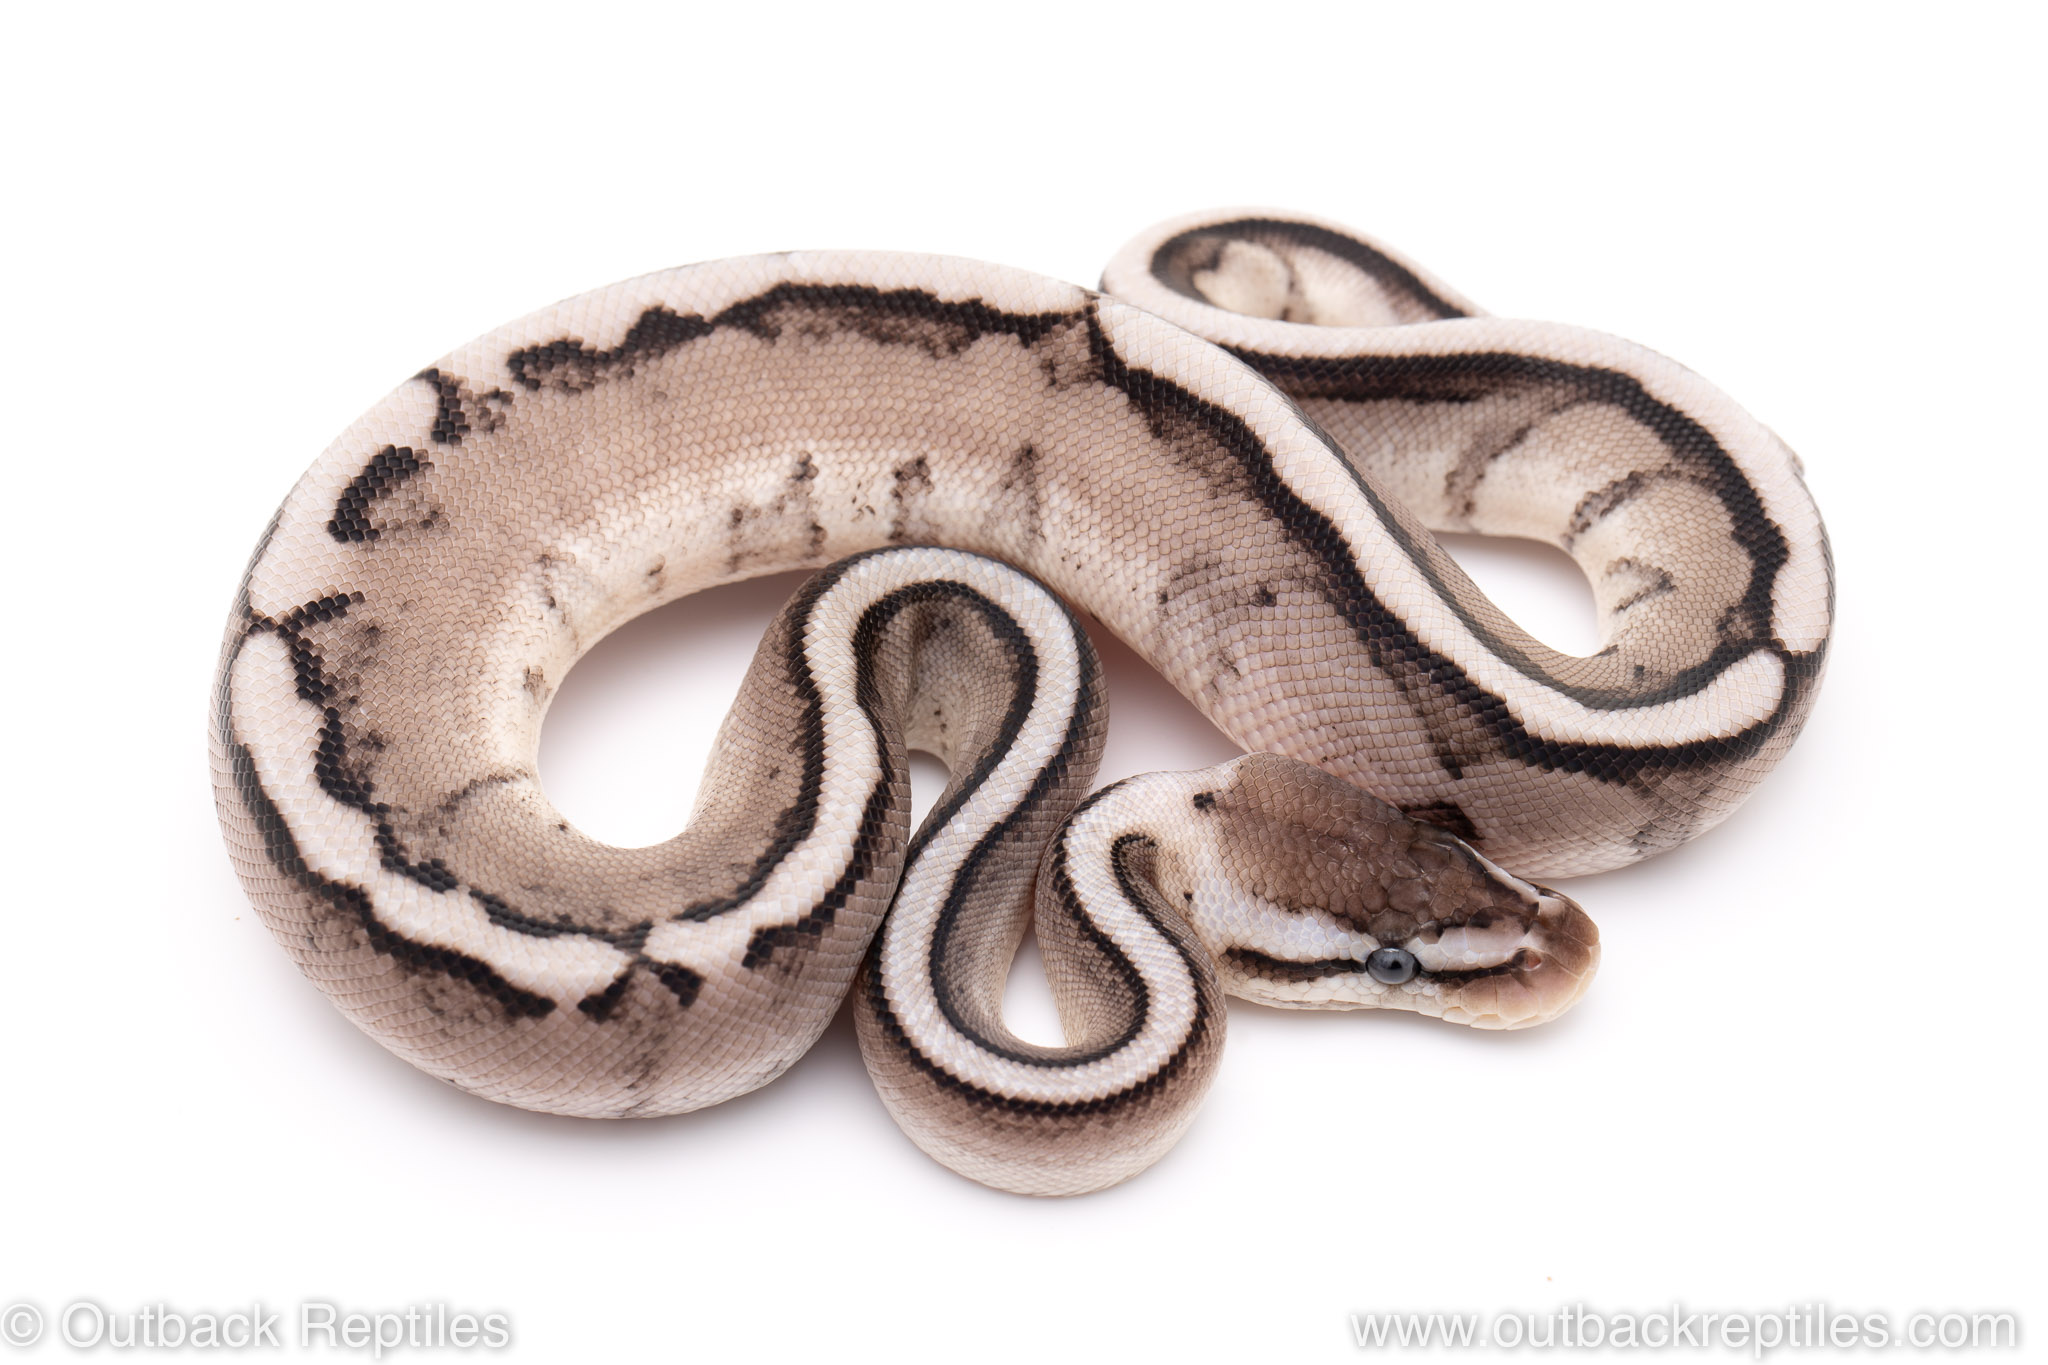 Pastel VPI Axanthic G-stripe ball python for sale